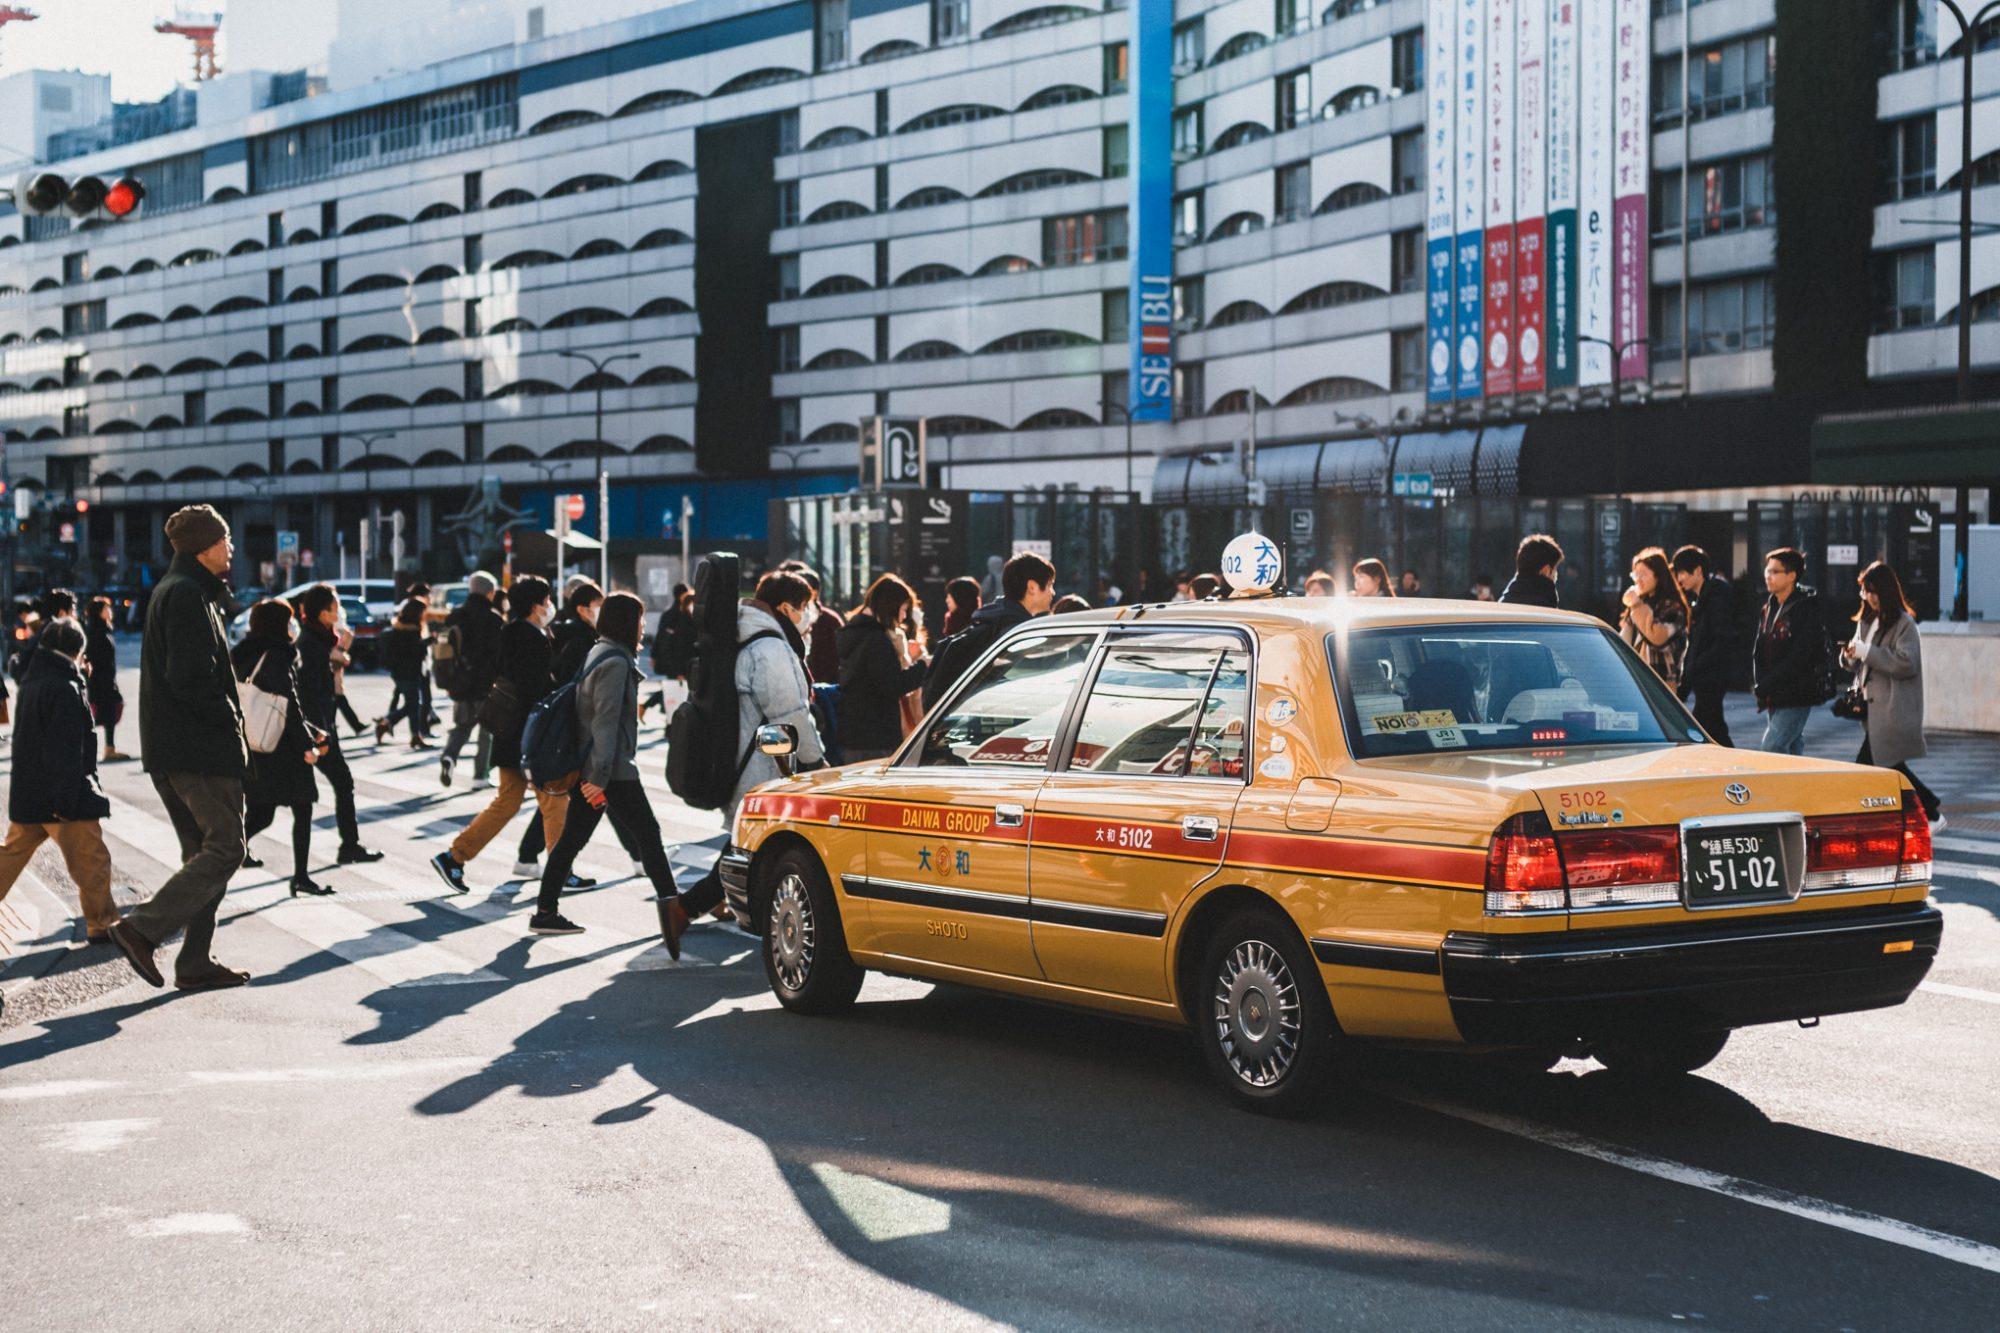 【S436】 摄影师Joe Allam旅行街拍摄影胶片后期修饰教程